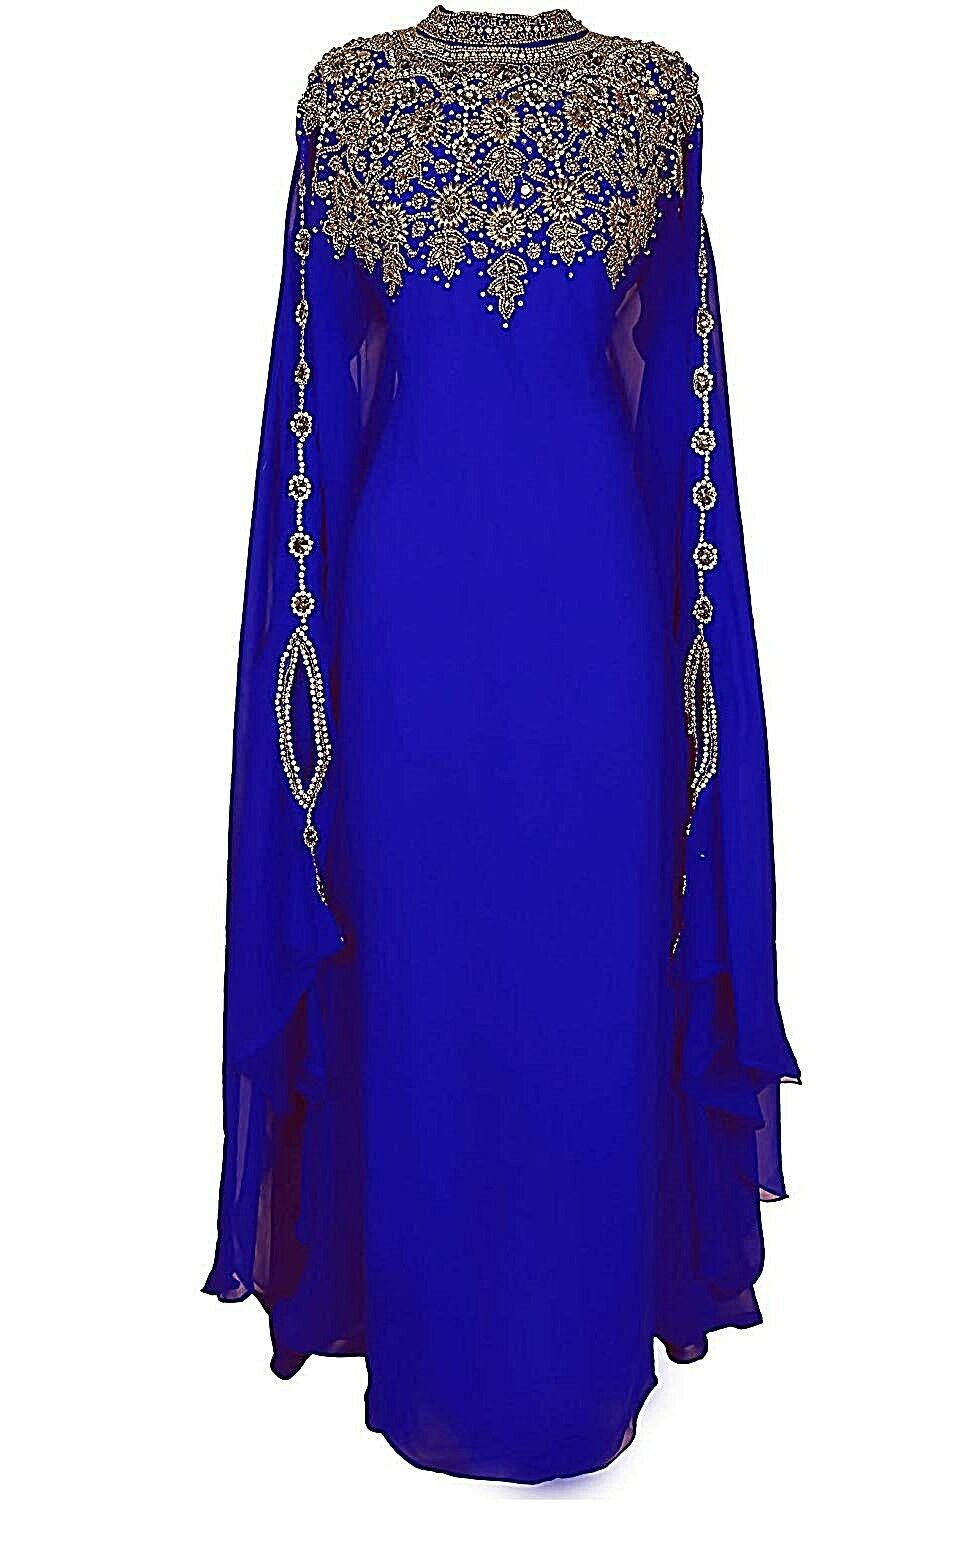 MgoldCCAN DUBAI blueE KAFTANS ABAYA DRESS VERY FANCY LONG GOWN MS10197